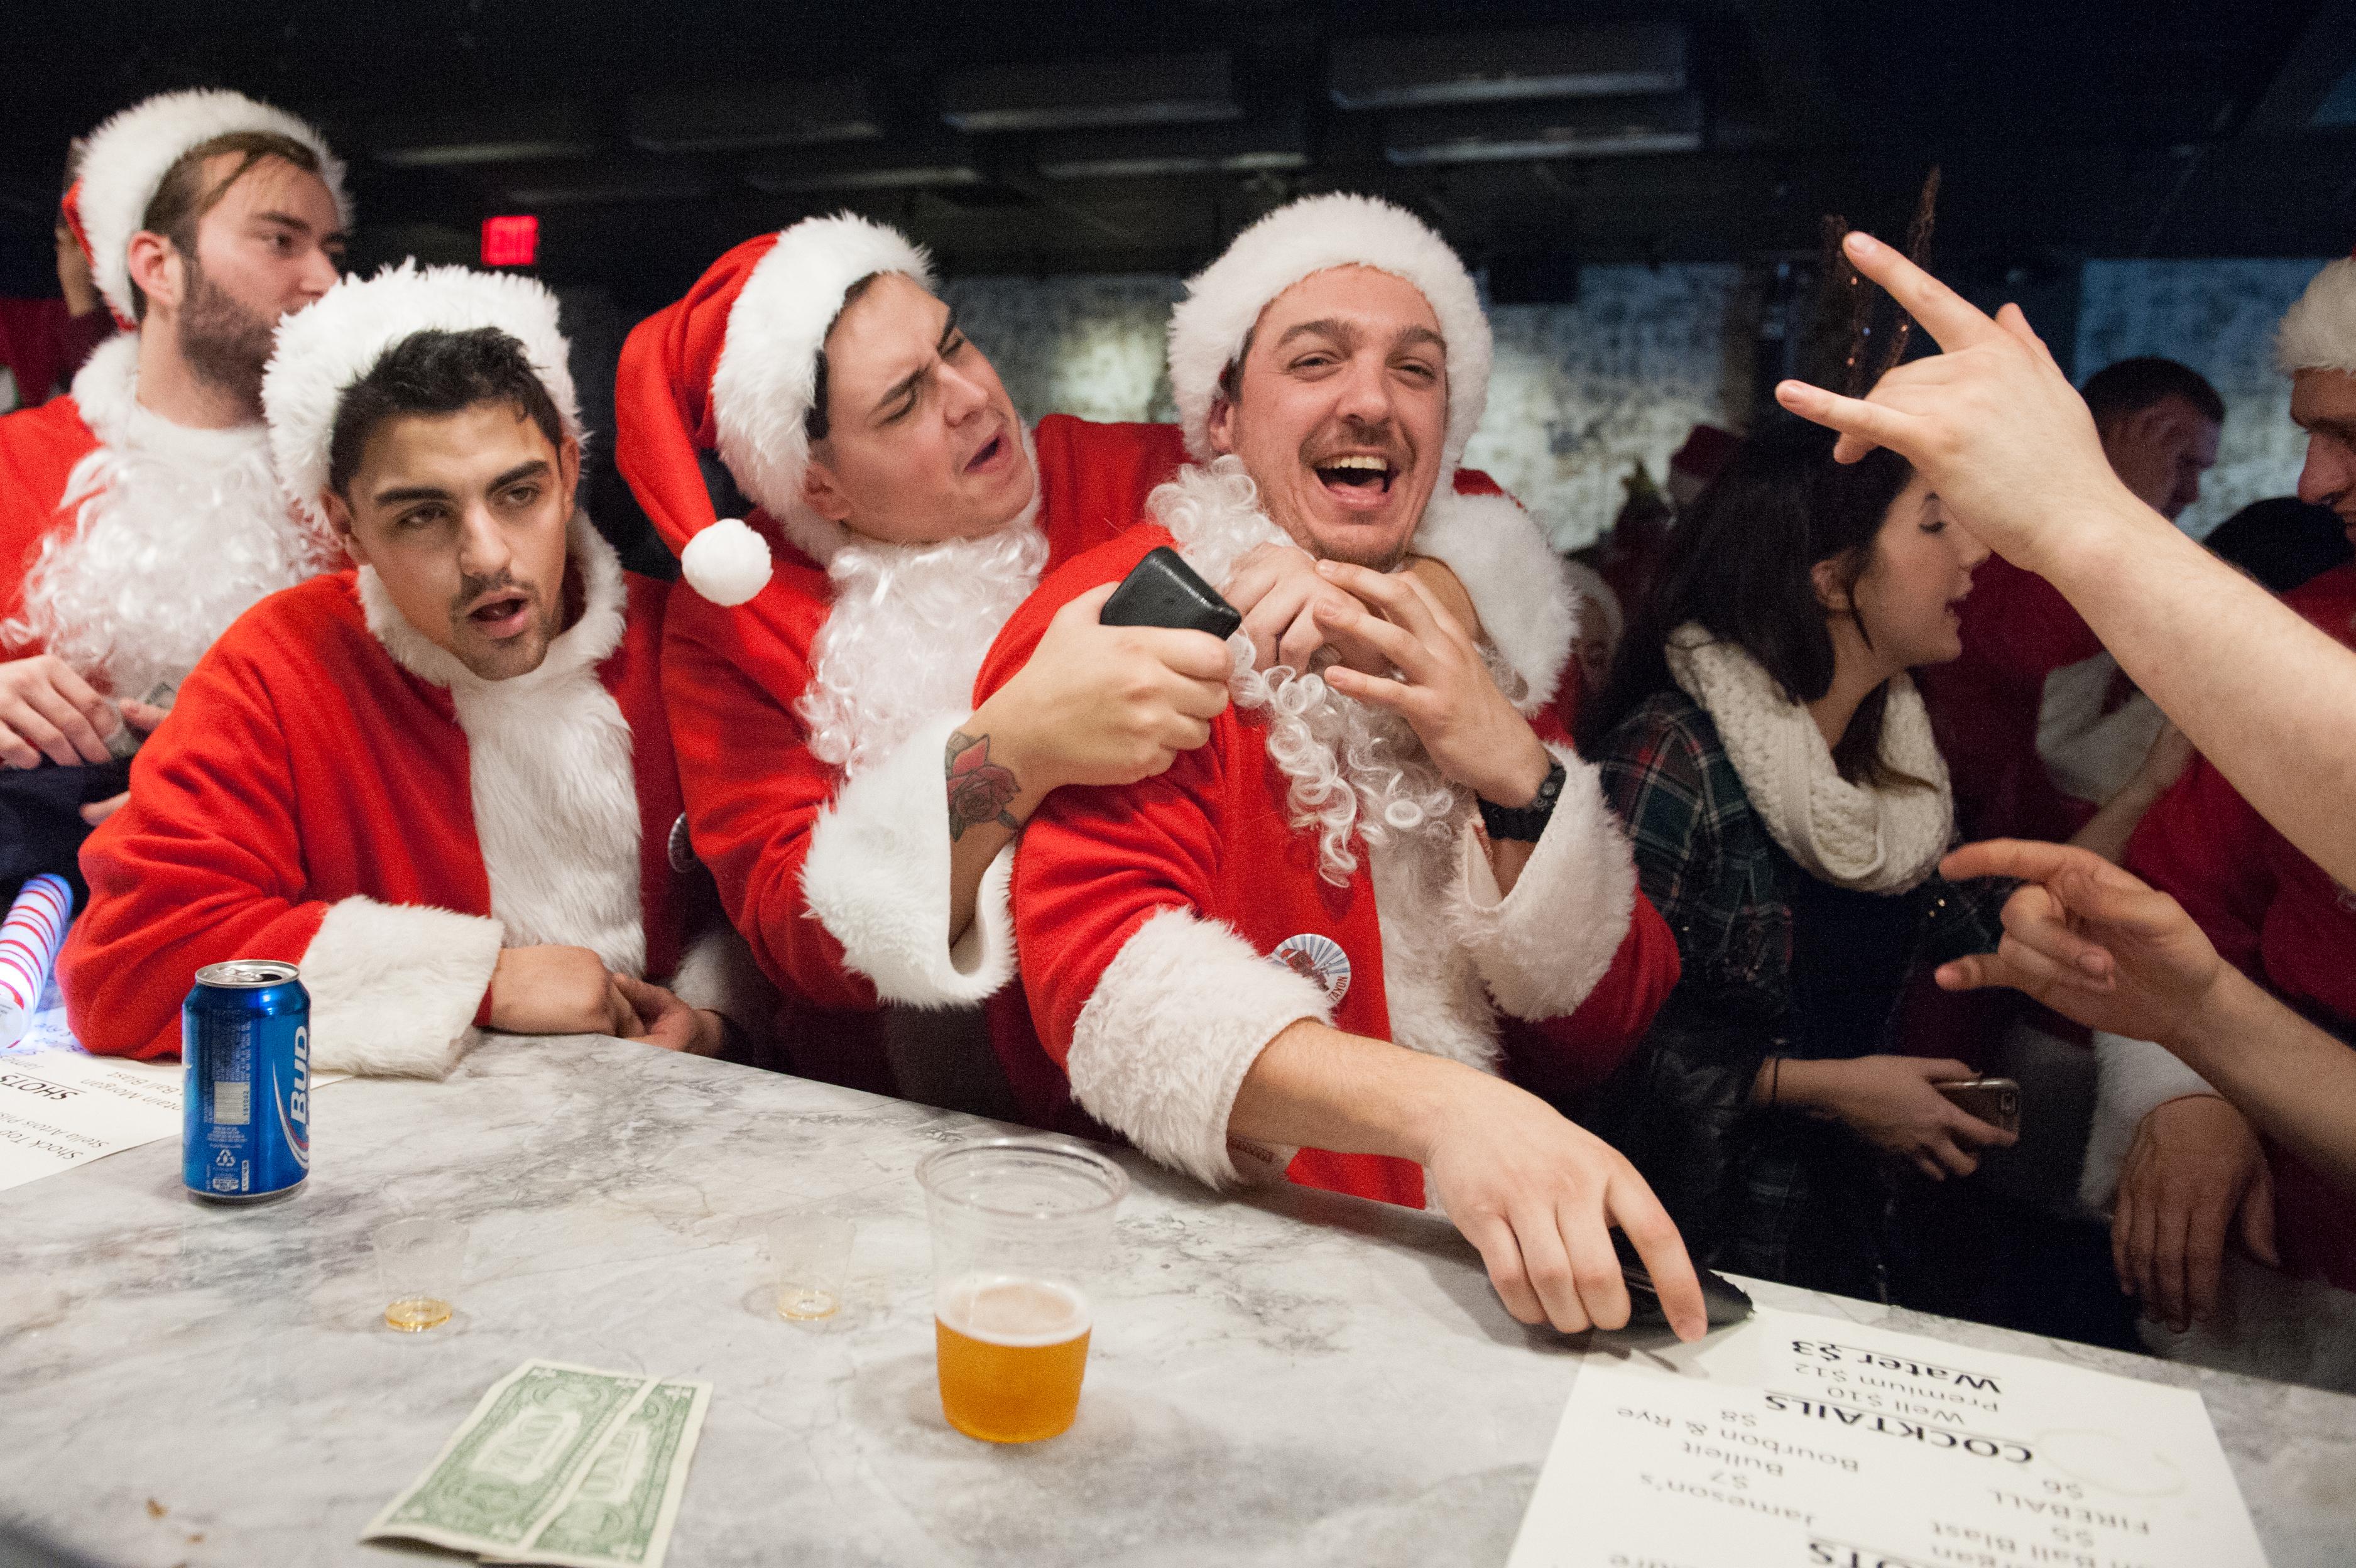 Annual SantaCon Pub Crawl Held In New York City